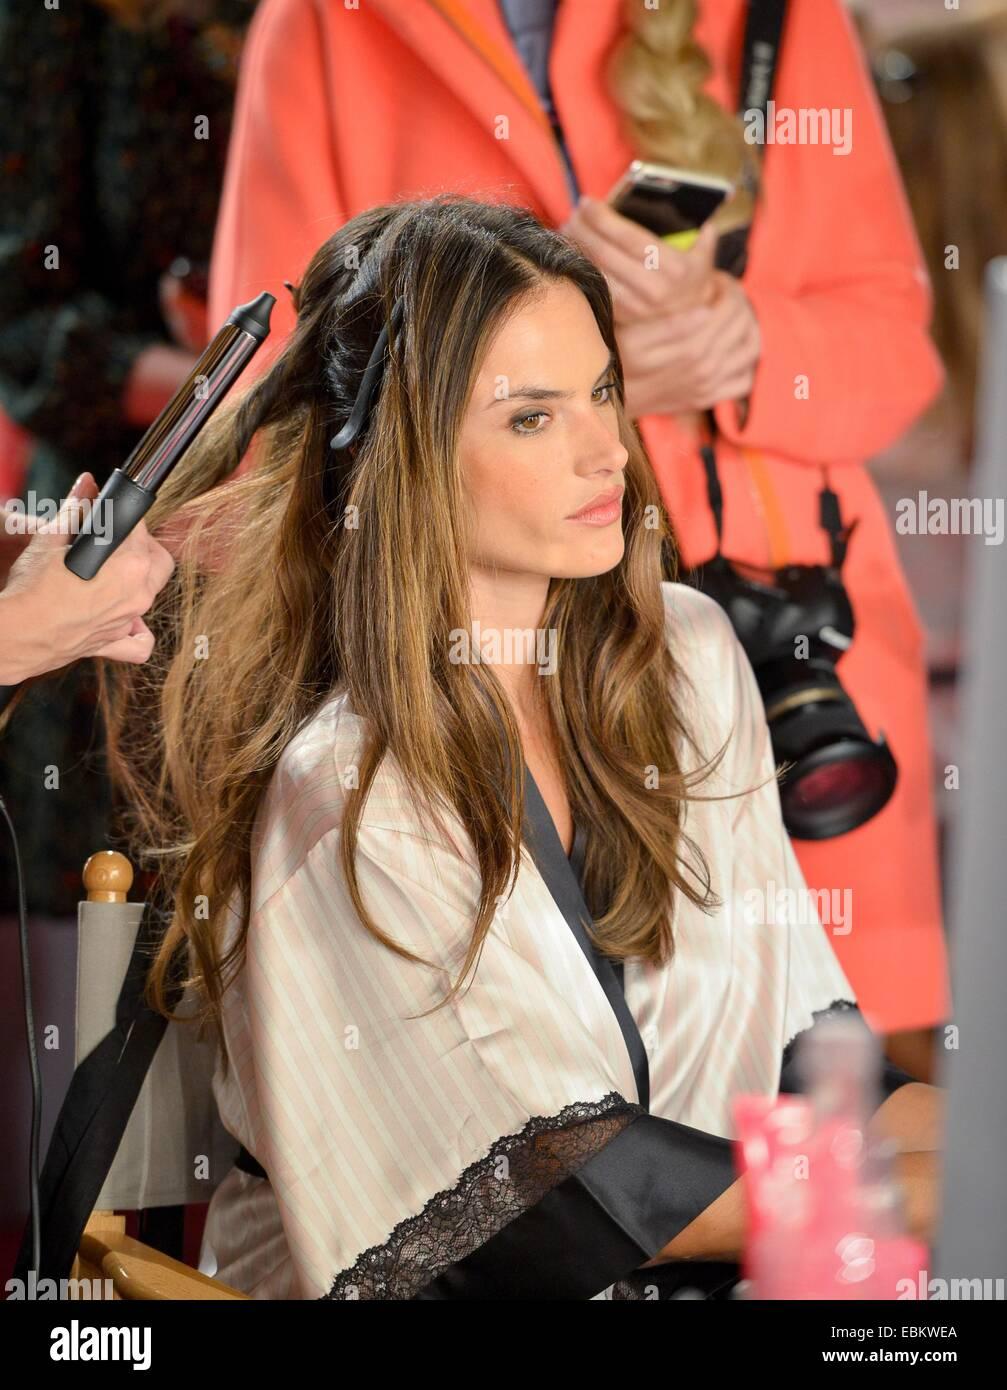 London Uk 2nd December 2014 Alessandra Ambrosio Backstage For Stock Photo Alamy